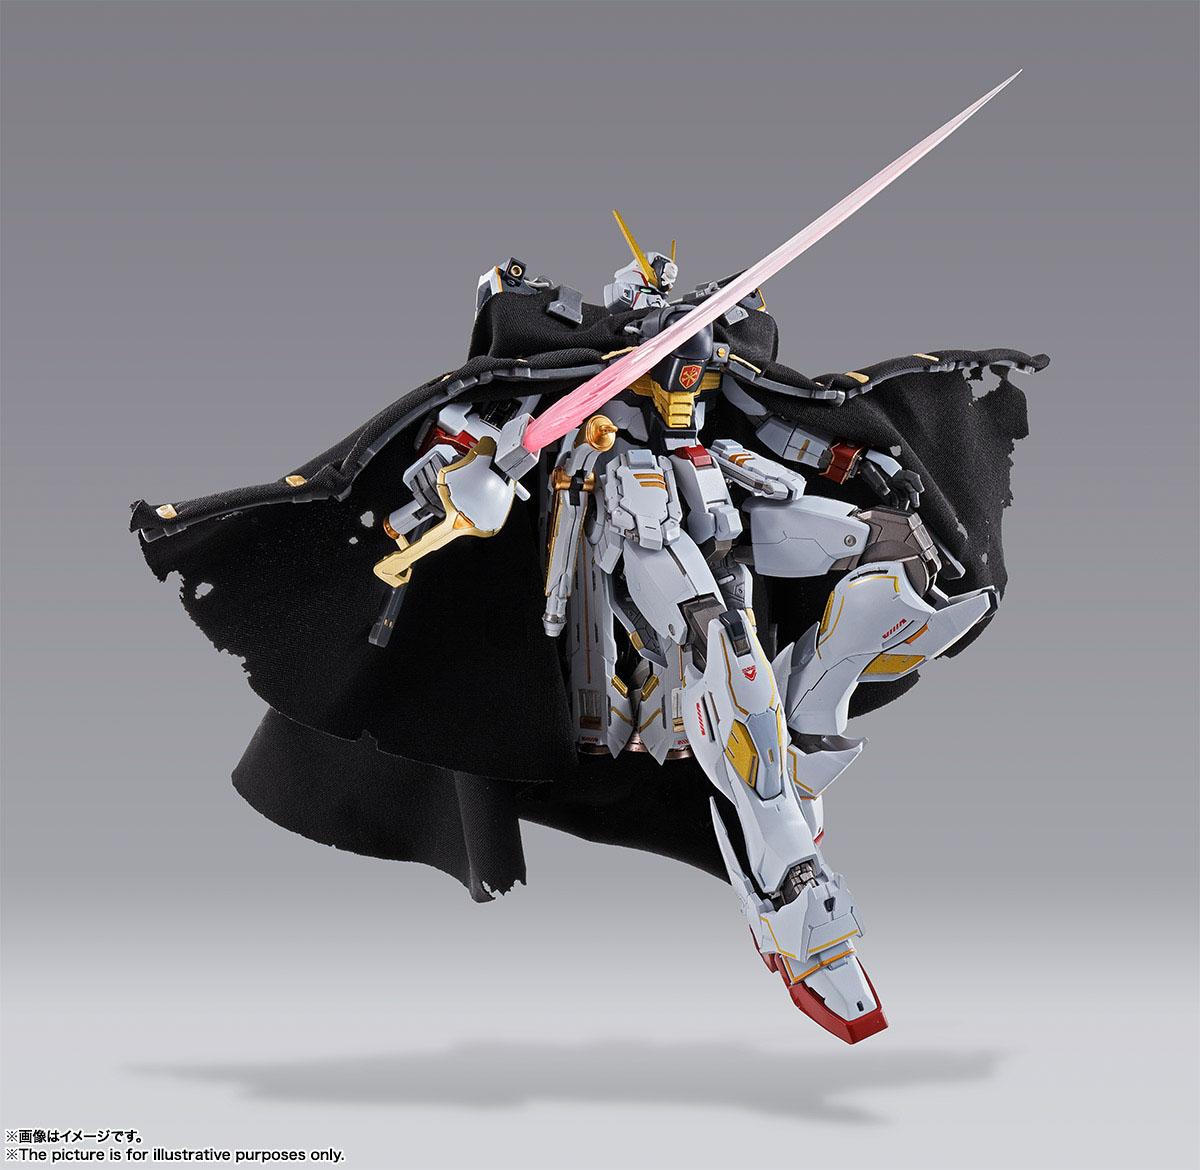 METAL BUILD『クロスボーン・ガンダムX1』機動戦士クロスボーン・ガンダム 可動フィギュア-003